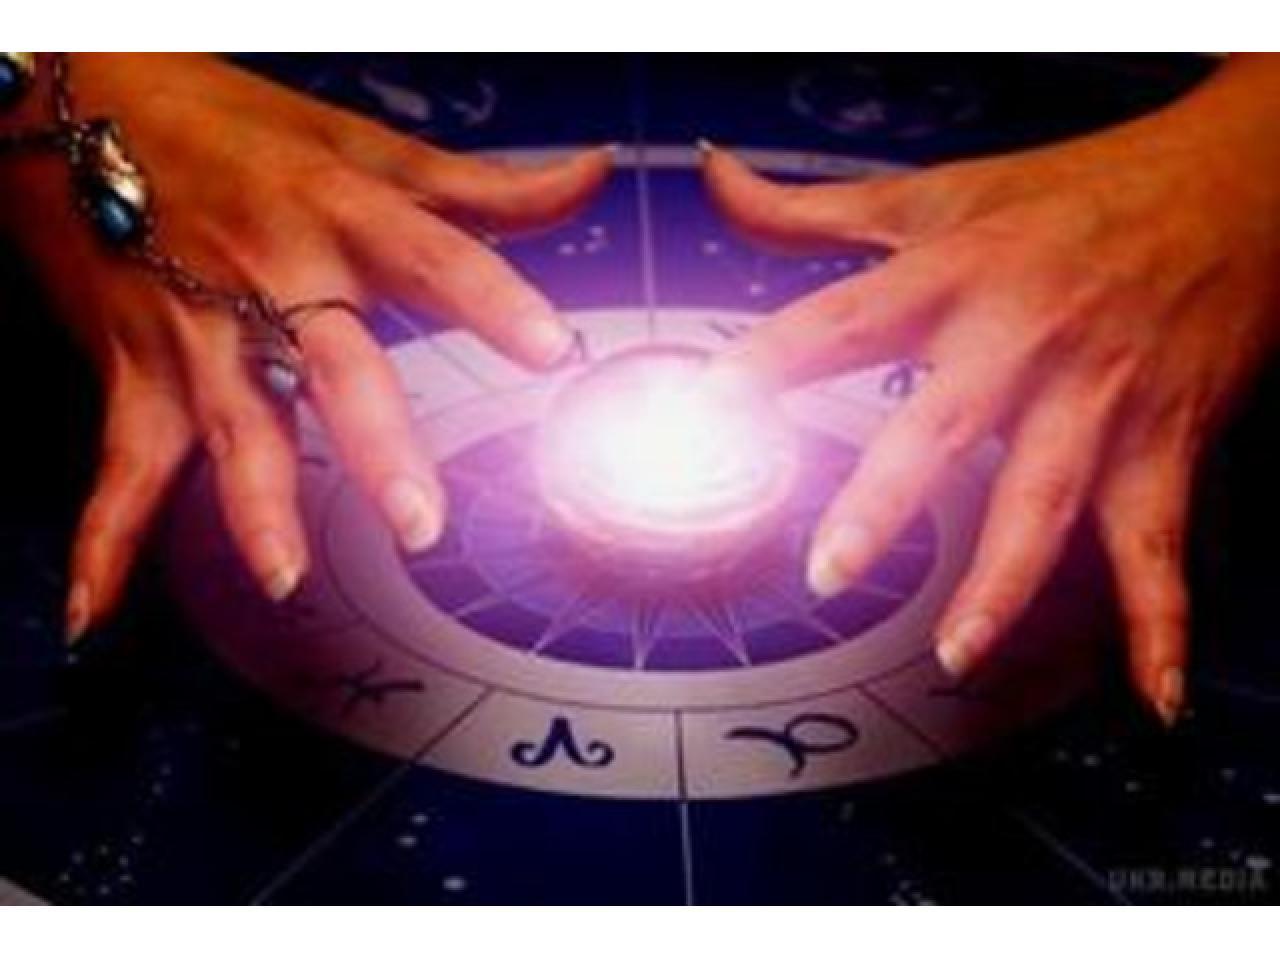 Магические услуги в США - 1